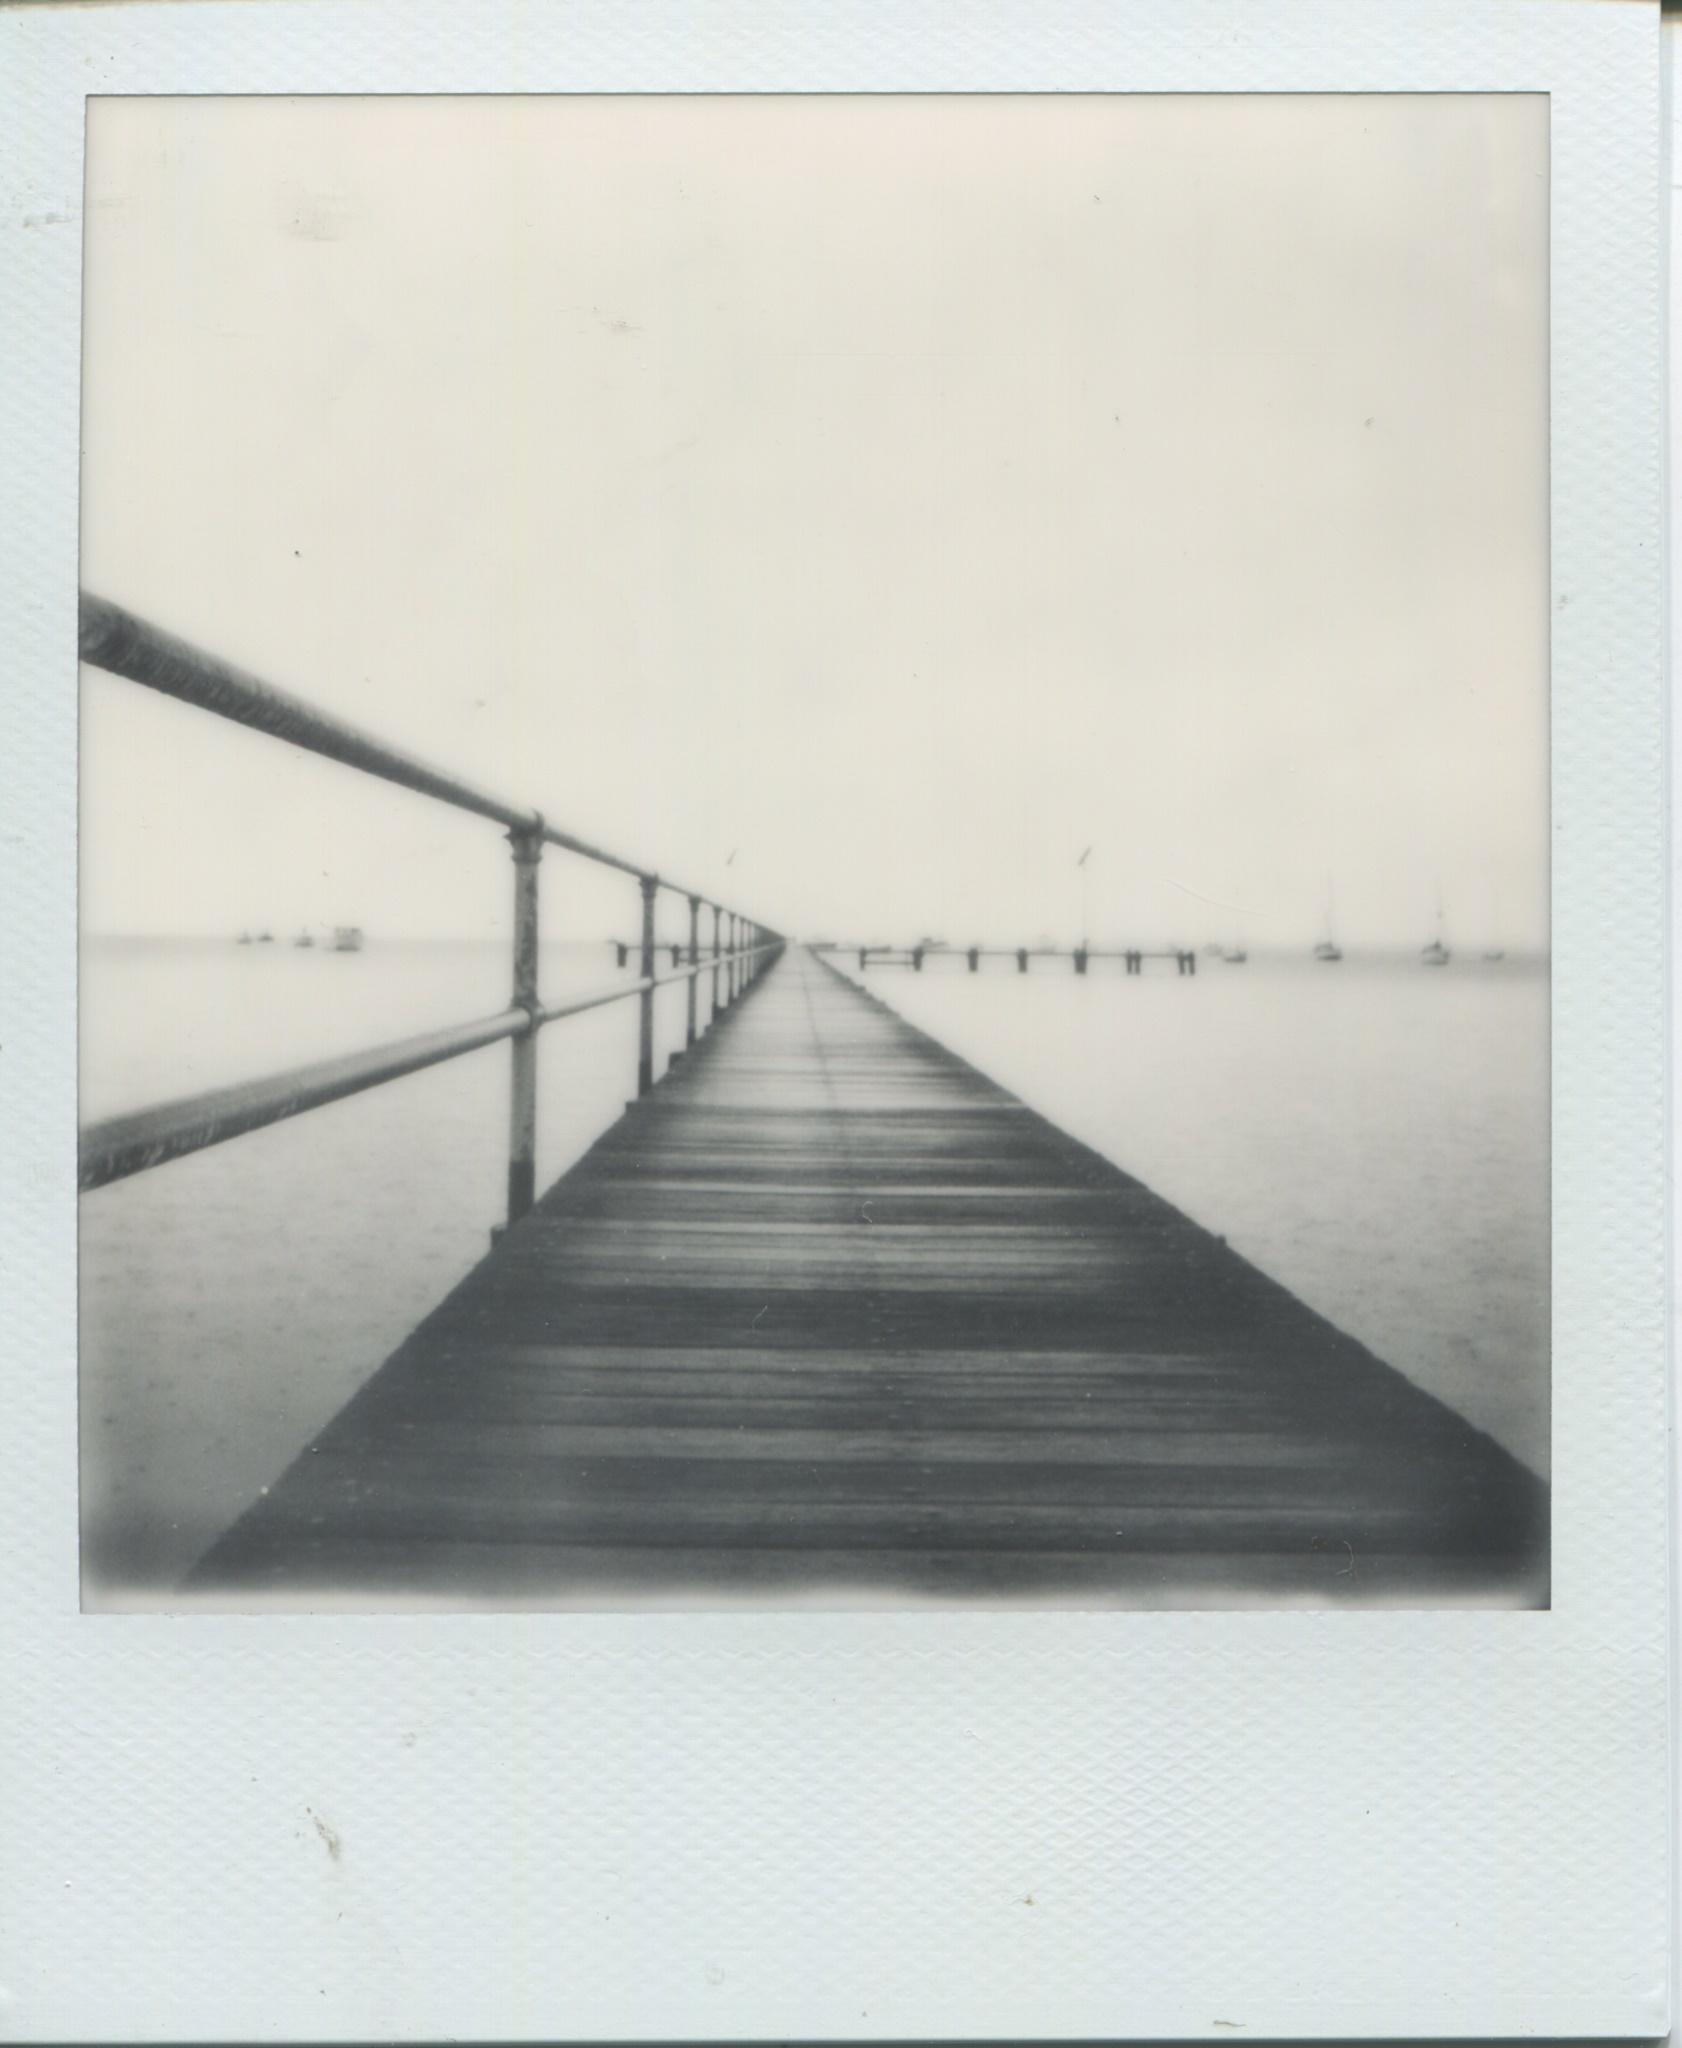 shortwalkoffalongpier | Polaroid 600 | Polaroid Originals 600 B/W | Fin Niccle